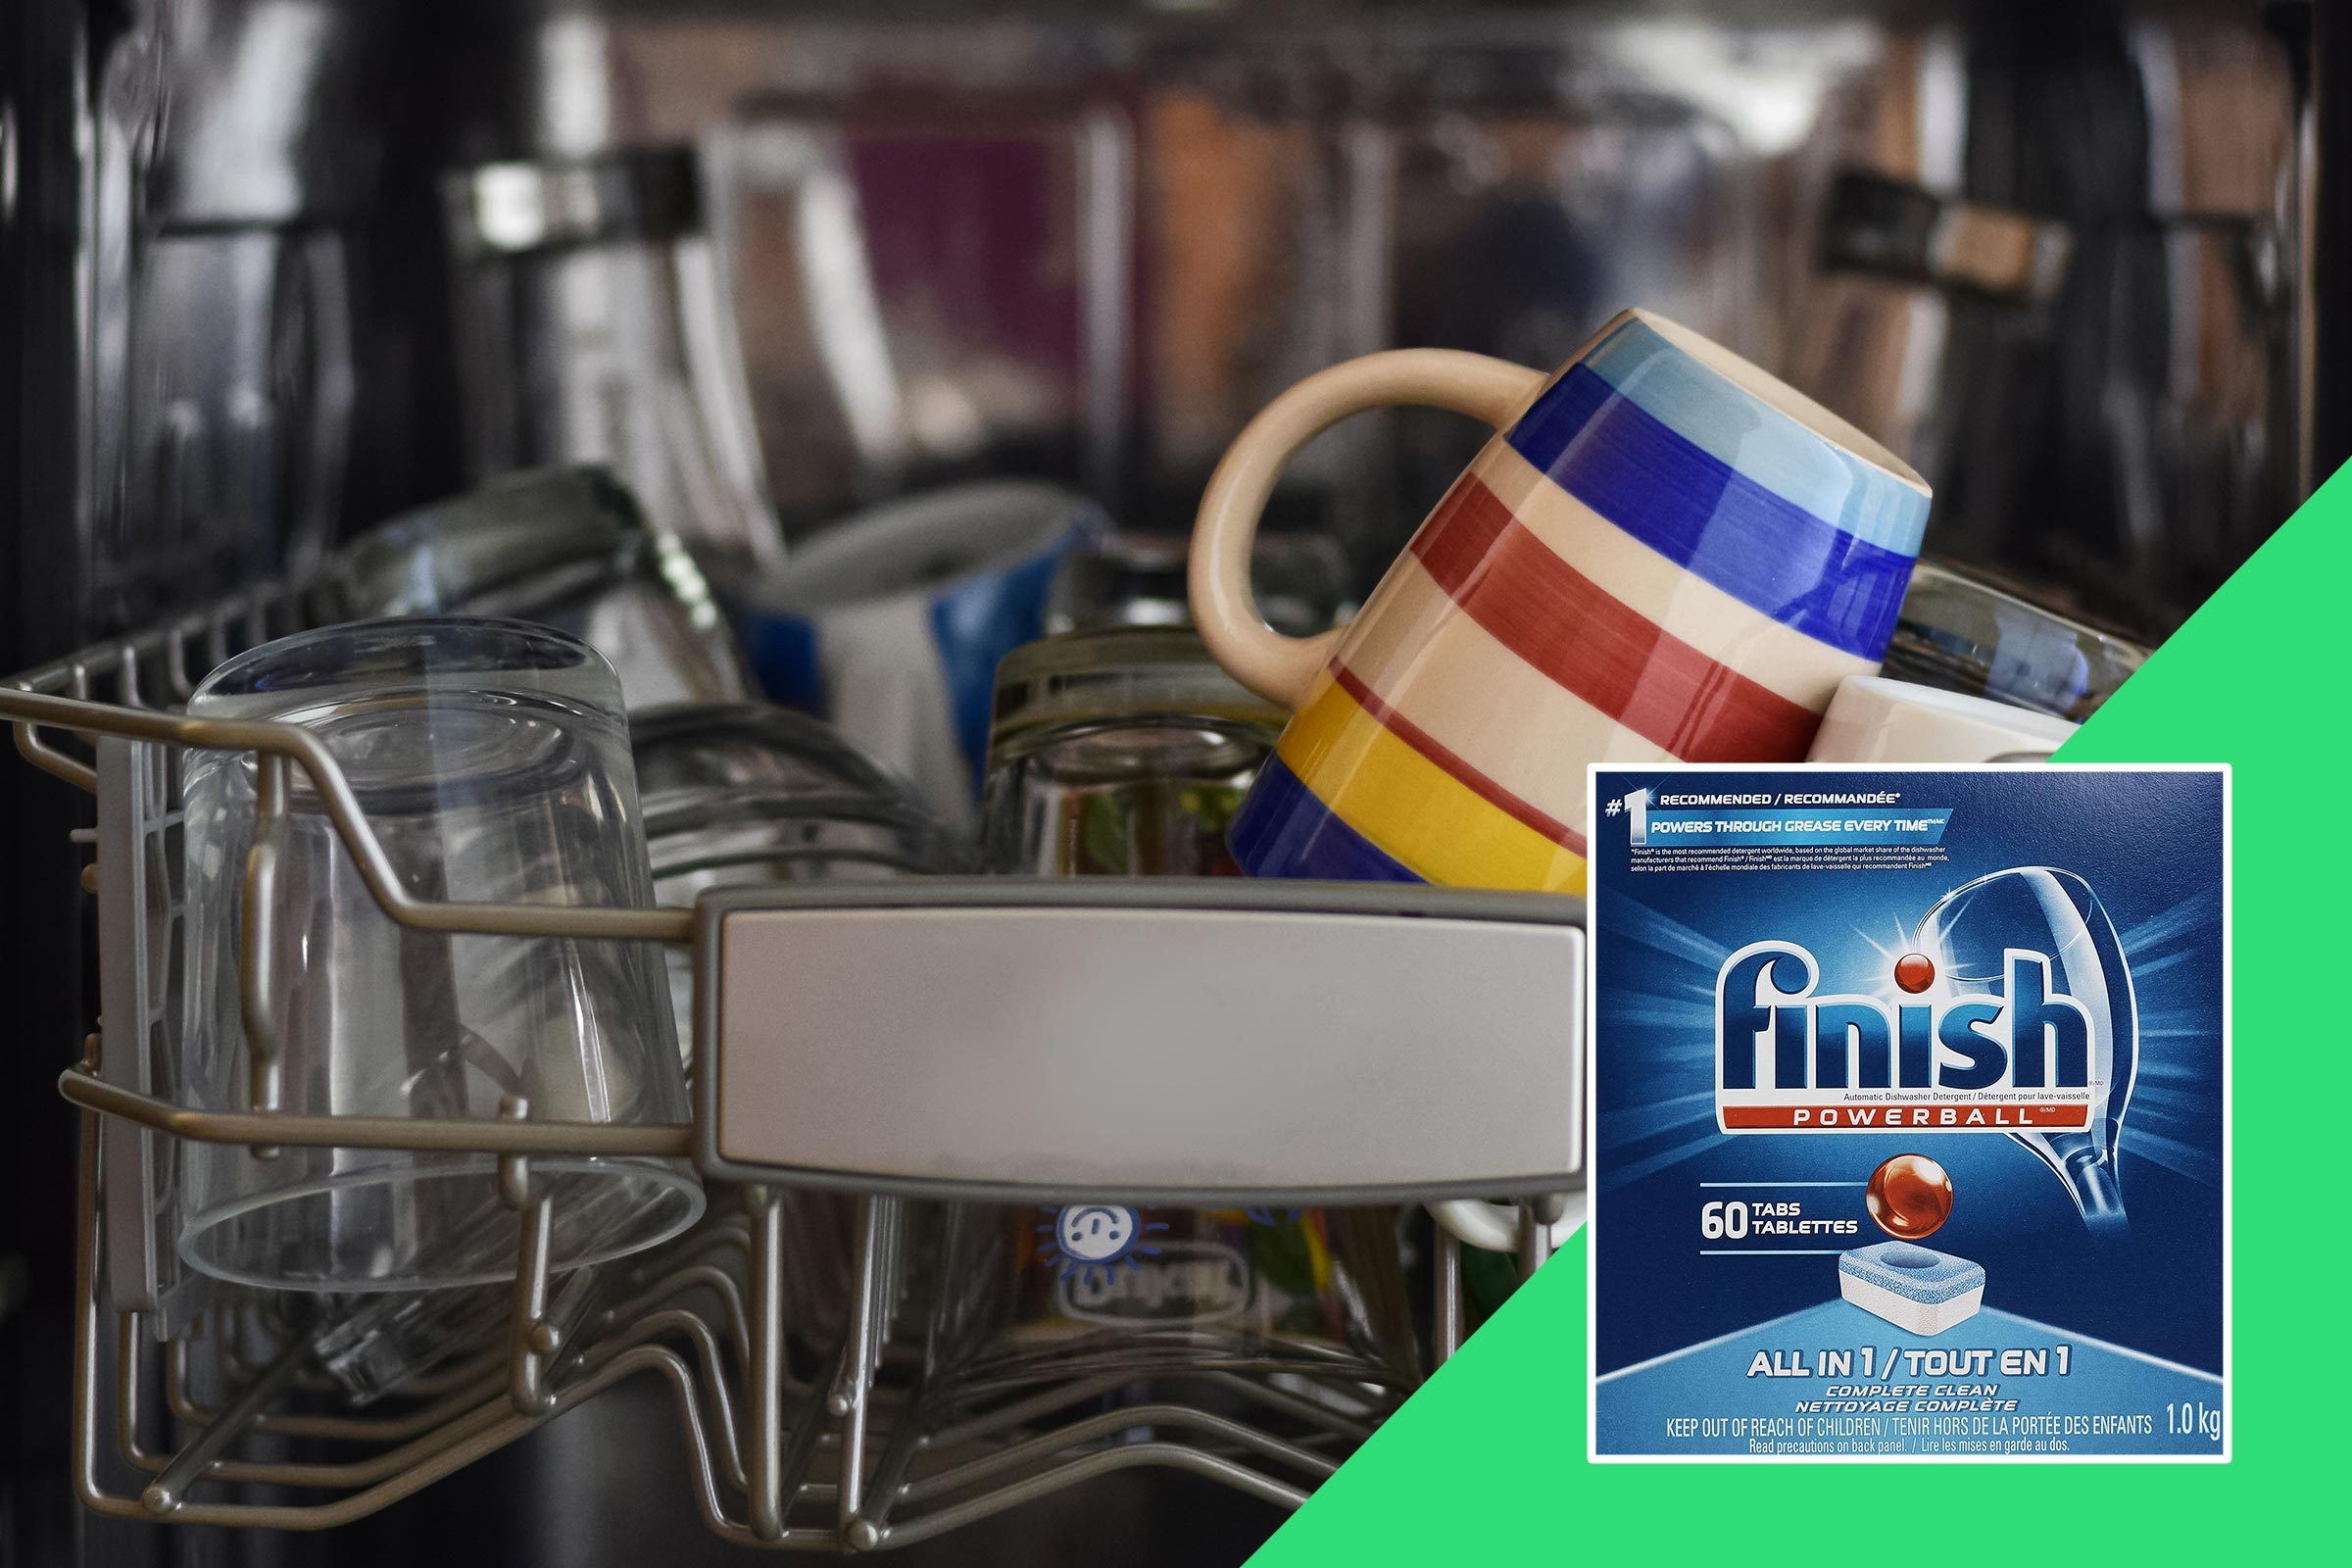 Mugs in the dishwasher